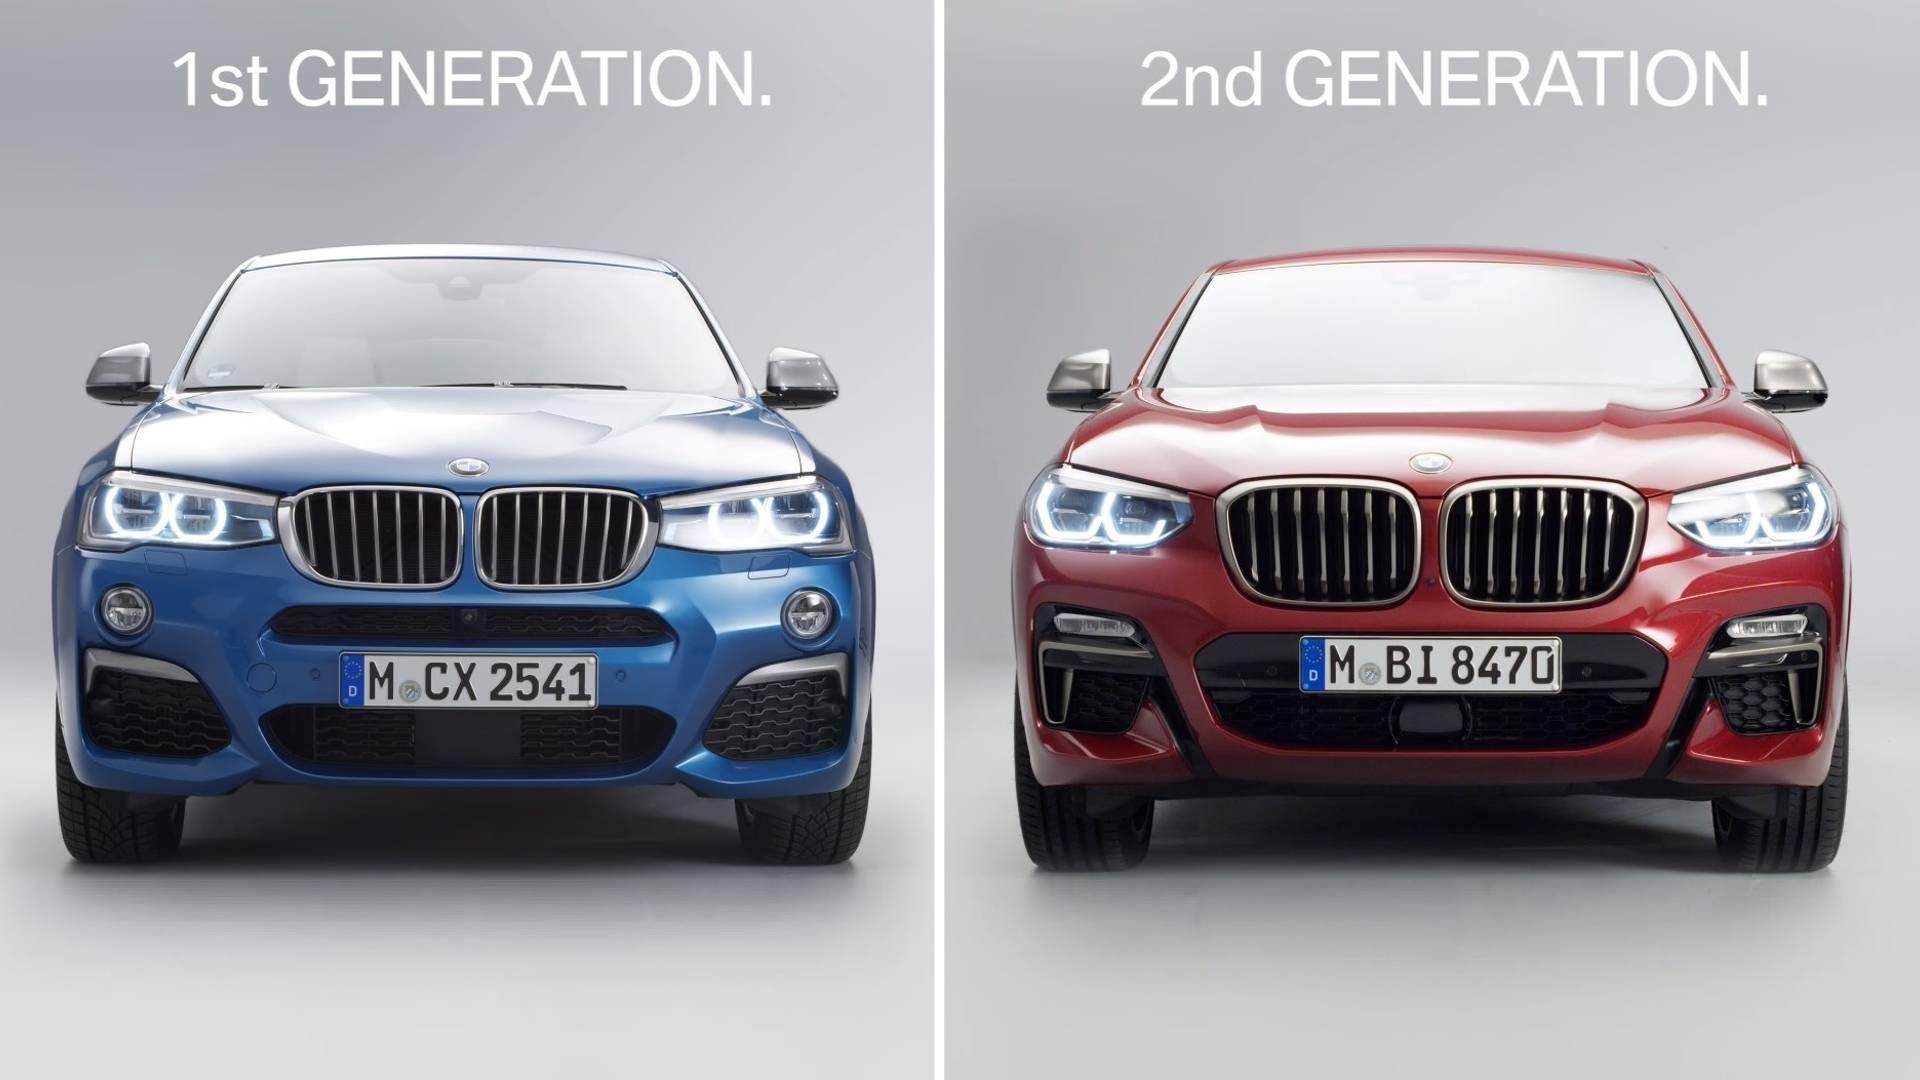 first gen bmw x4 vs second gen bmw x4 بی ام و x4 مدل ۲۰۱۹ رونمایی شد   اجاره ماشین